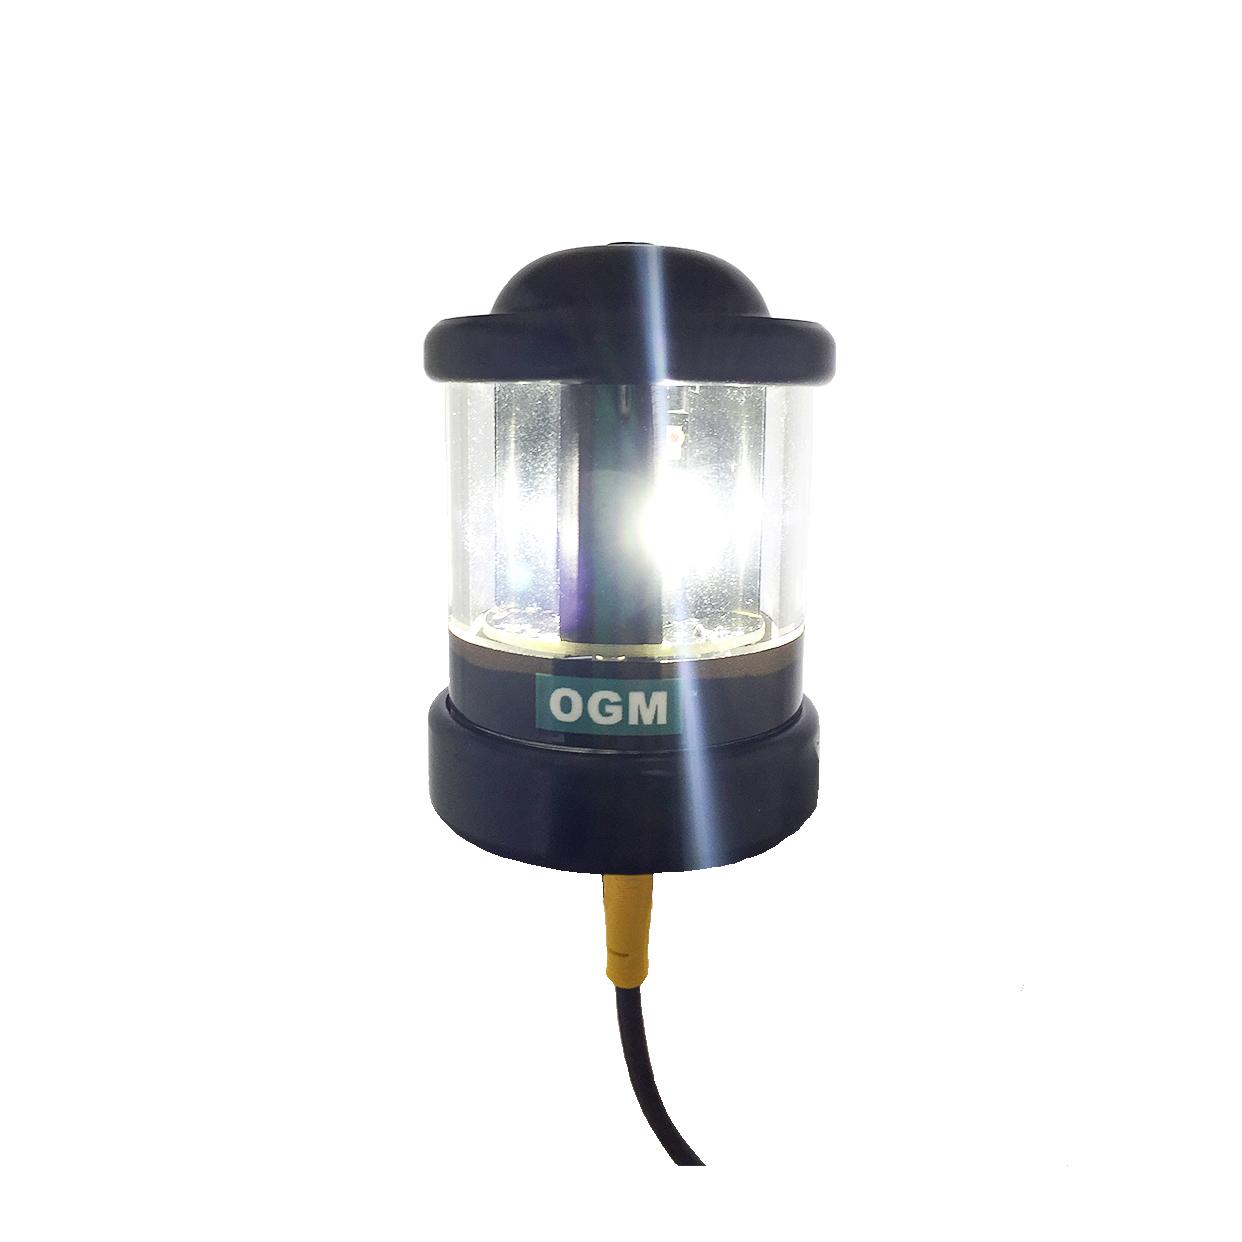 OGM Q Series Anchor Light